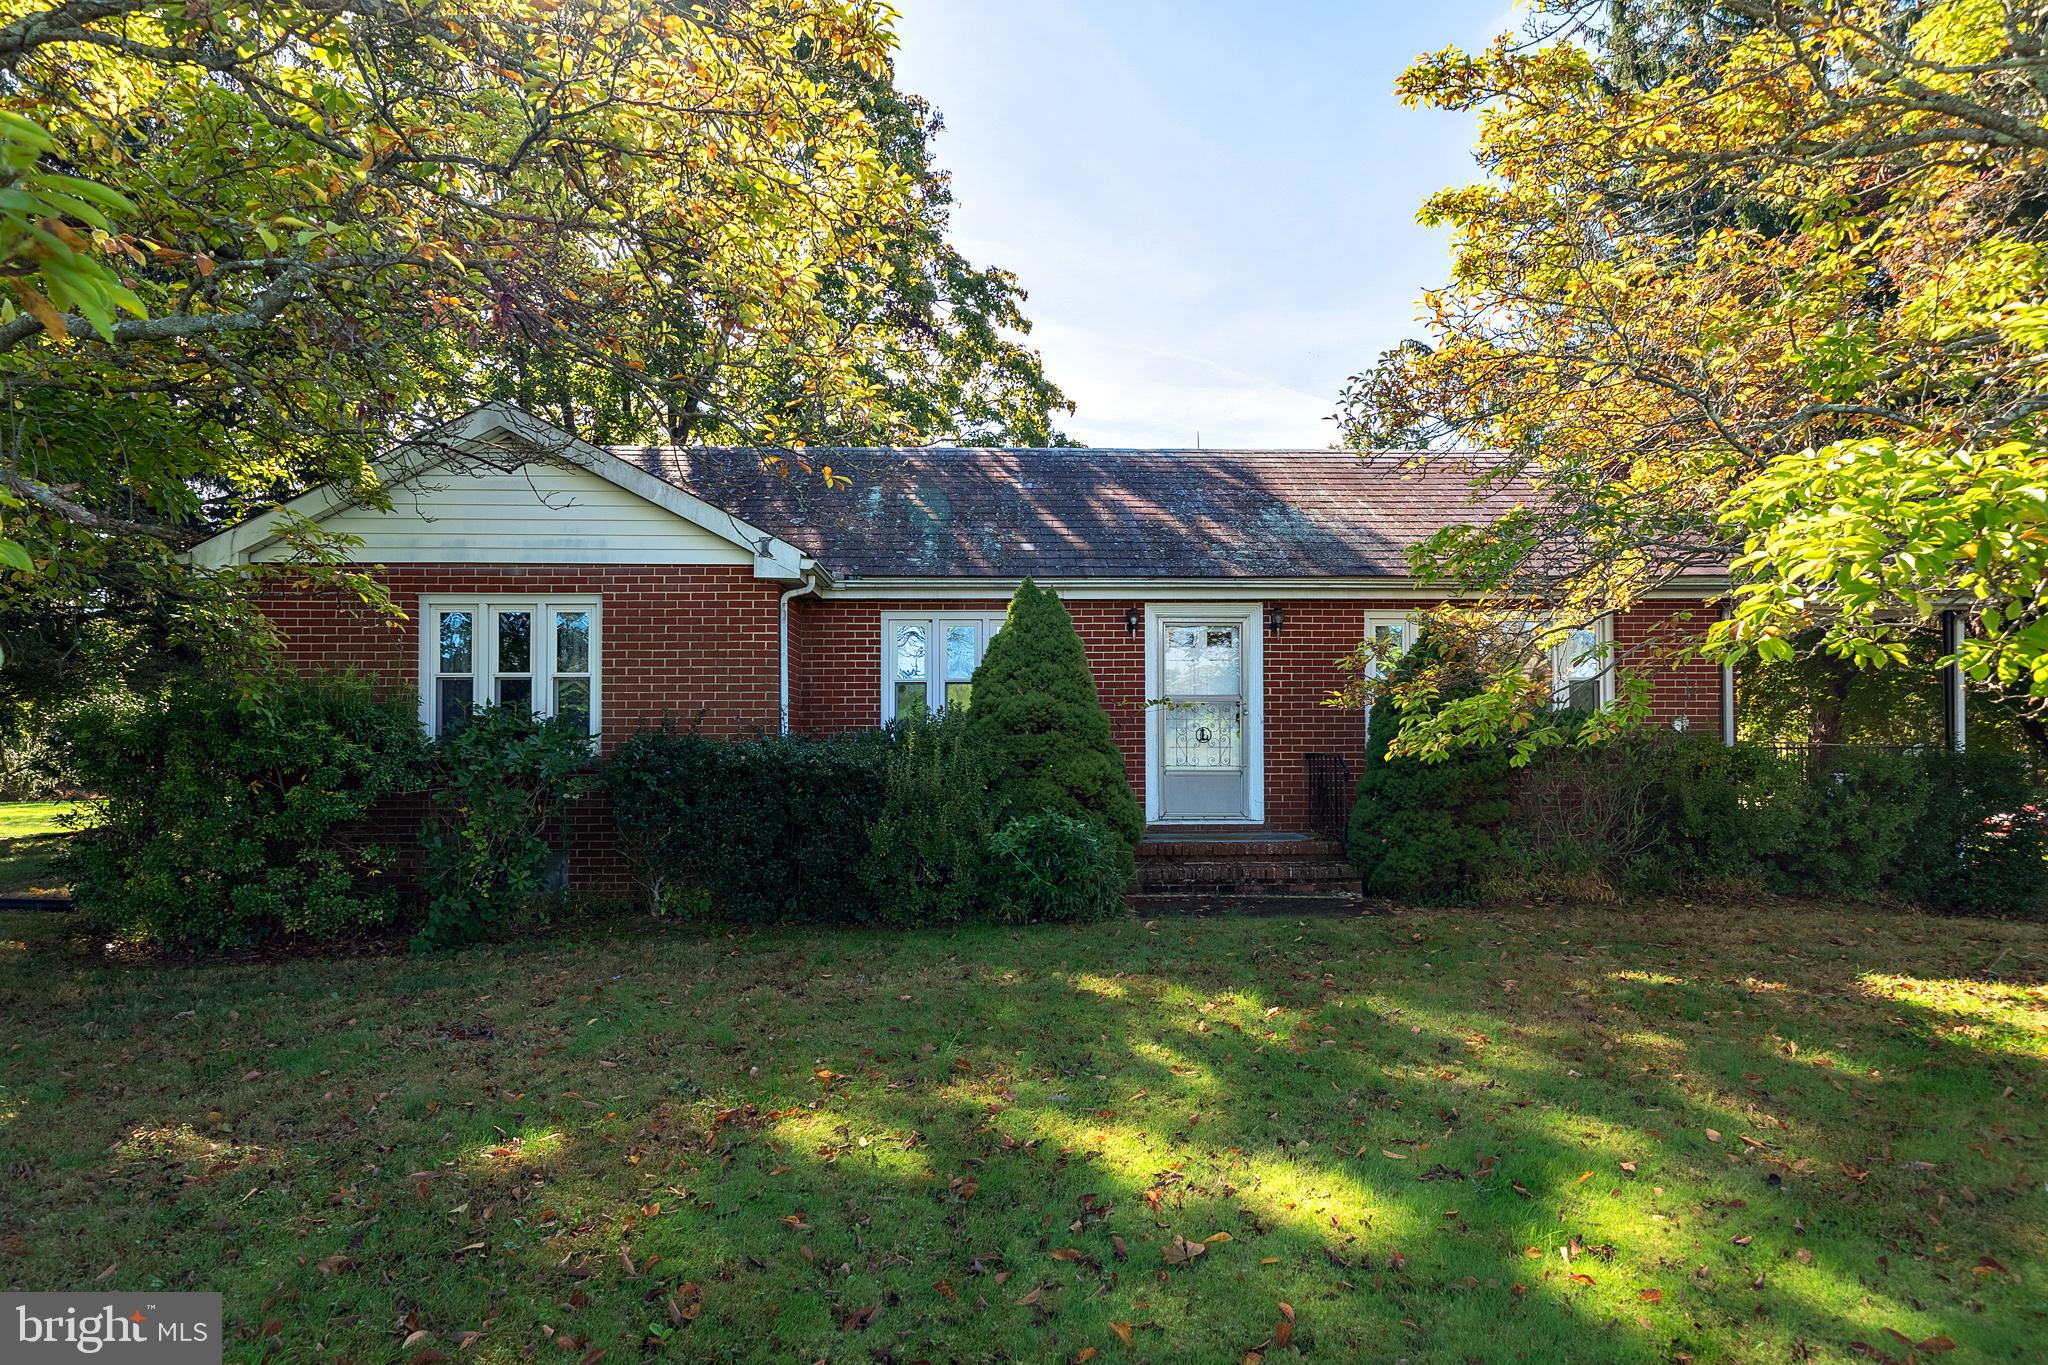 158 Featherbed Lane, Flemington, NJ 08822